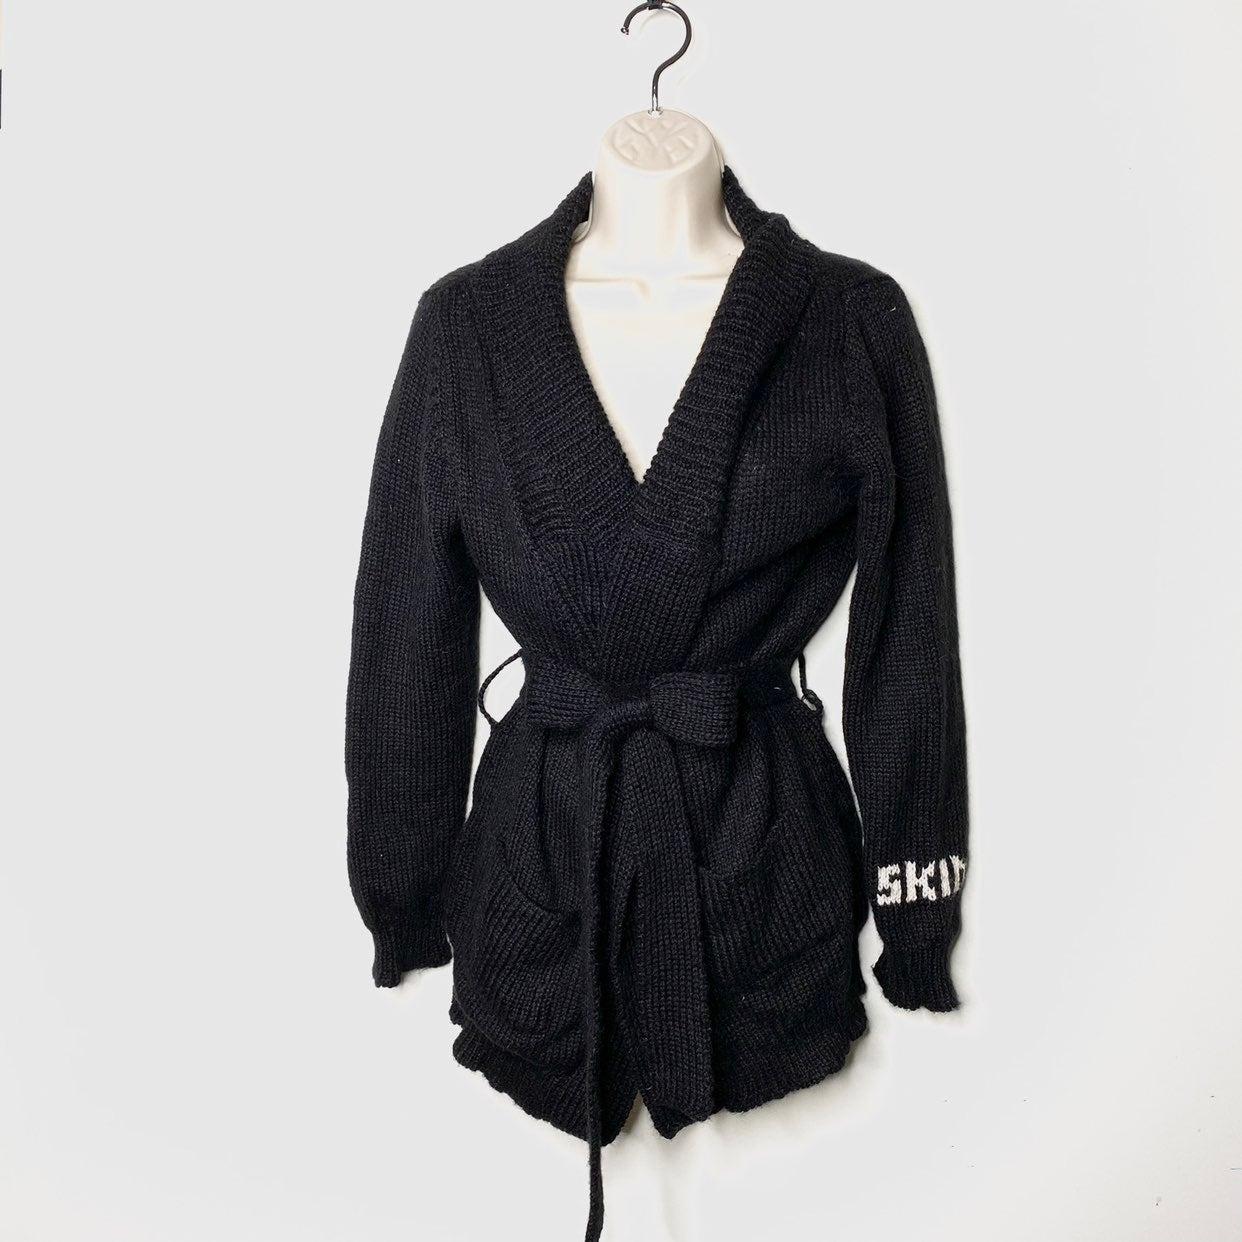 Skin black alpaca cardigan waist belt sw